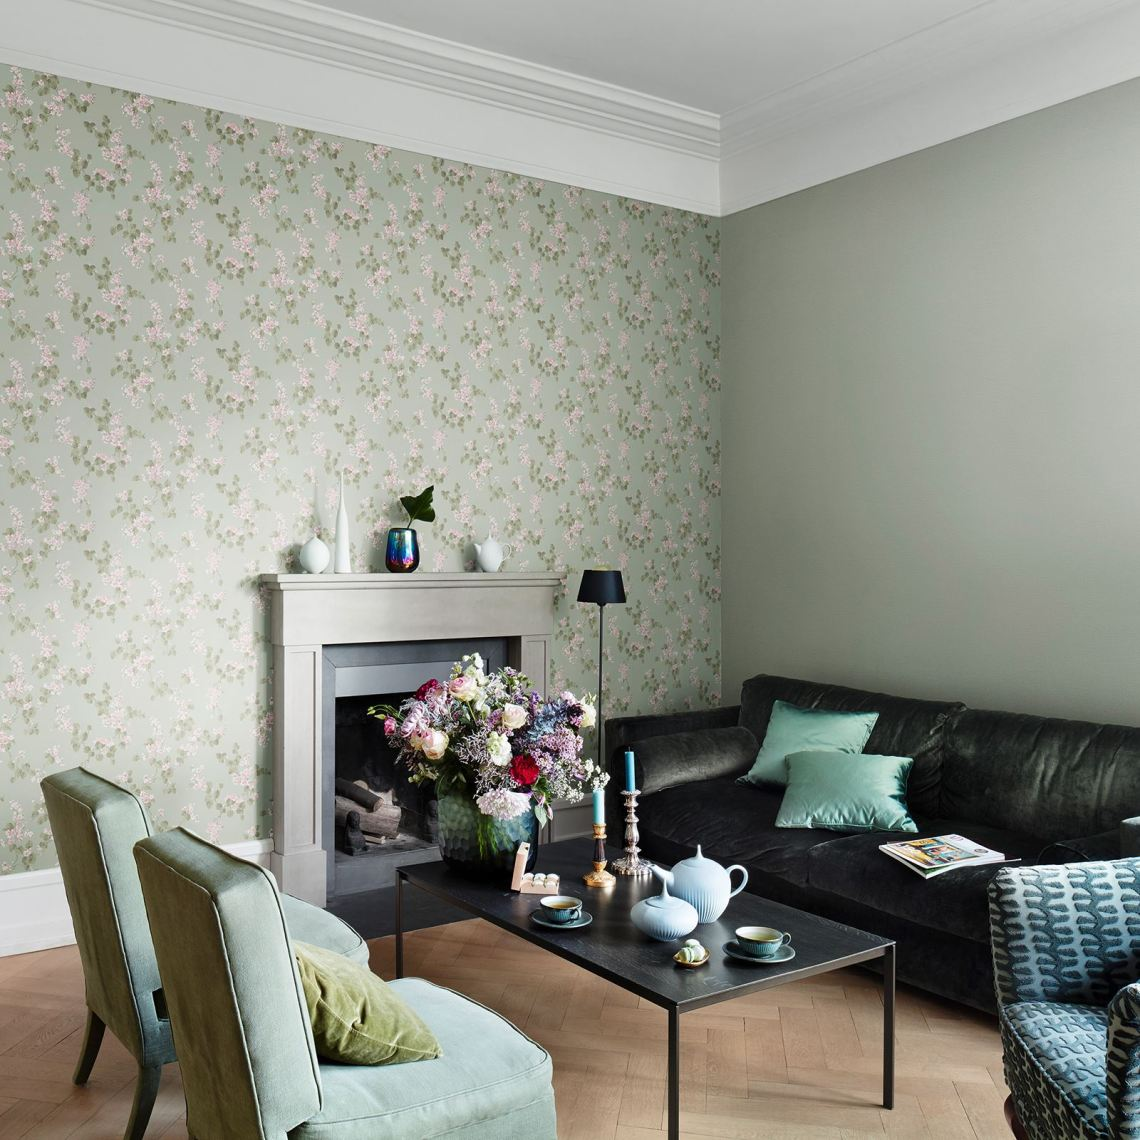 Rasch Emilia Floral Blossom Amp Rose Wallpaper Shabby Mint Green And Green Interior Living Room 1600x1600 Wallpaper Teahub Io